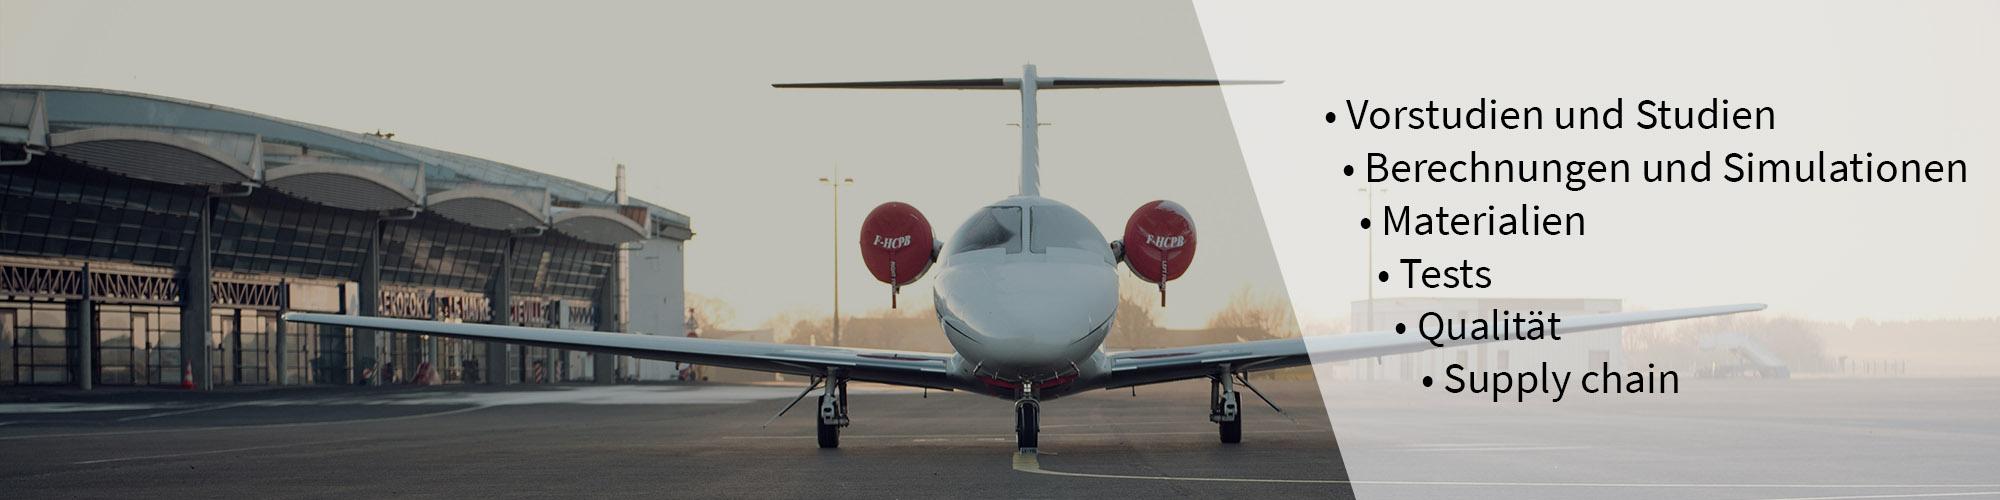 aeronautics Luftfahrt adequate